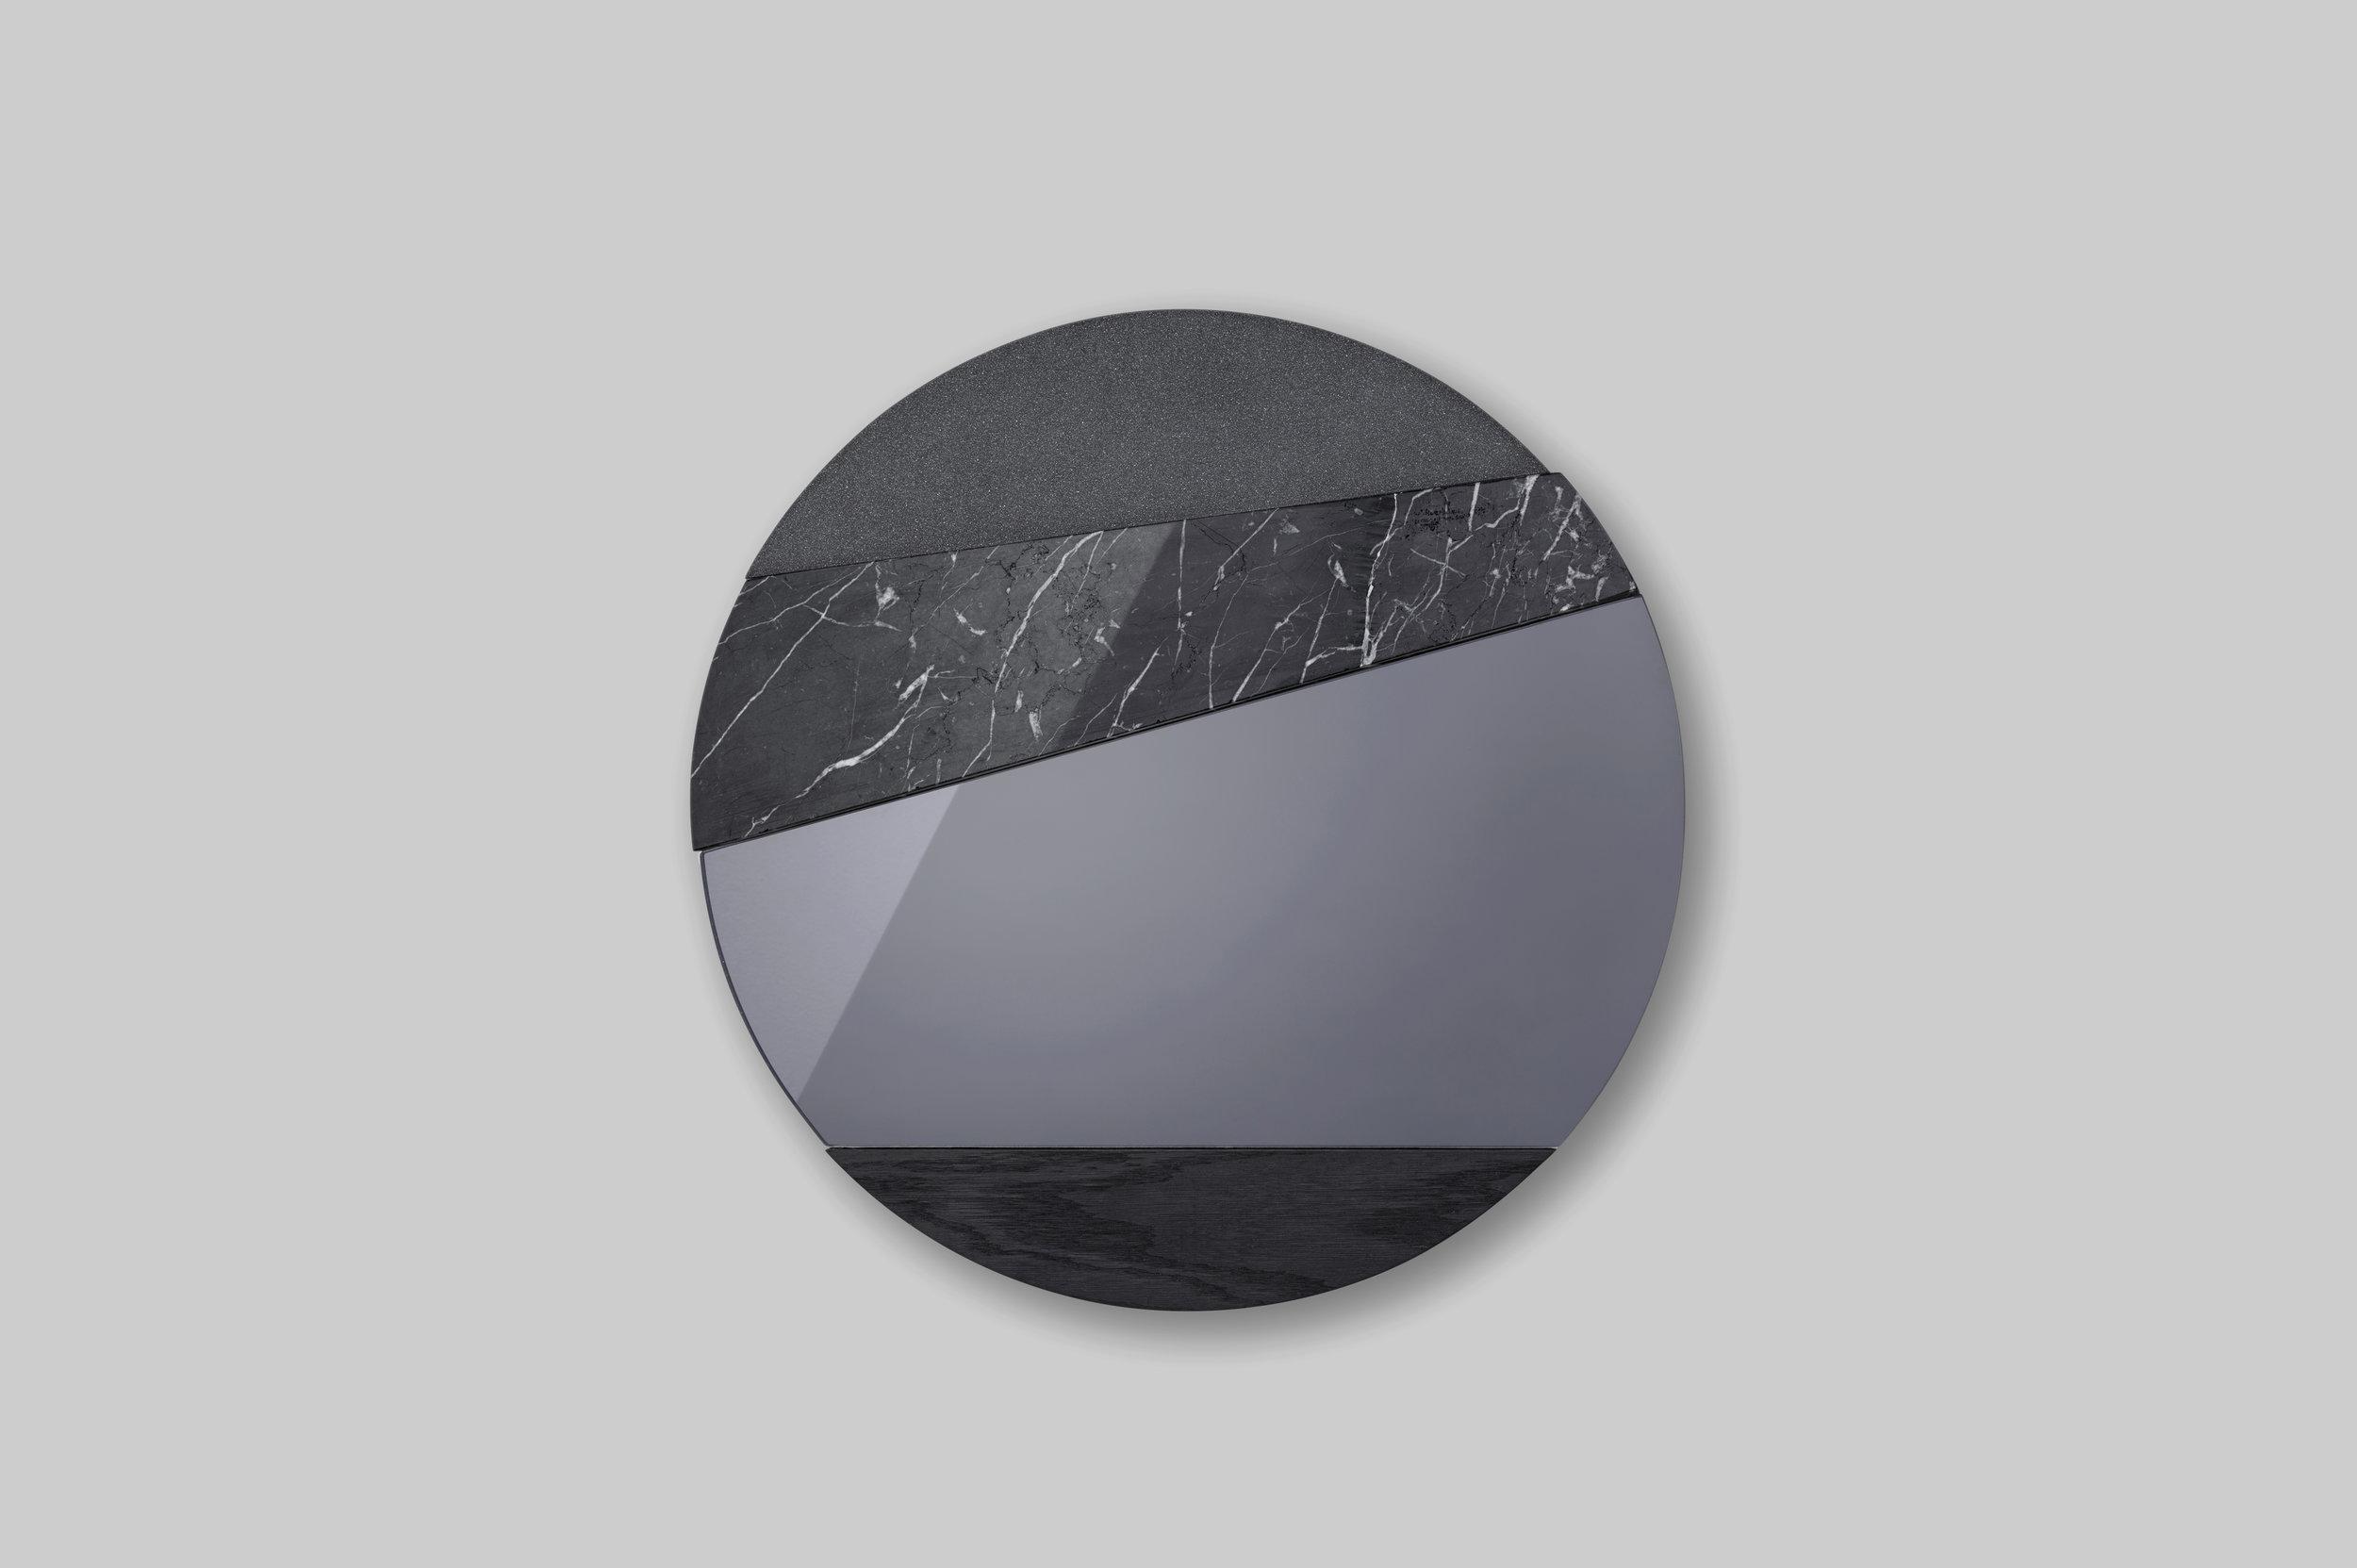 cooperativa-panoramica-mono-8-mirror - Copy (37945857).jpg